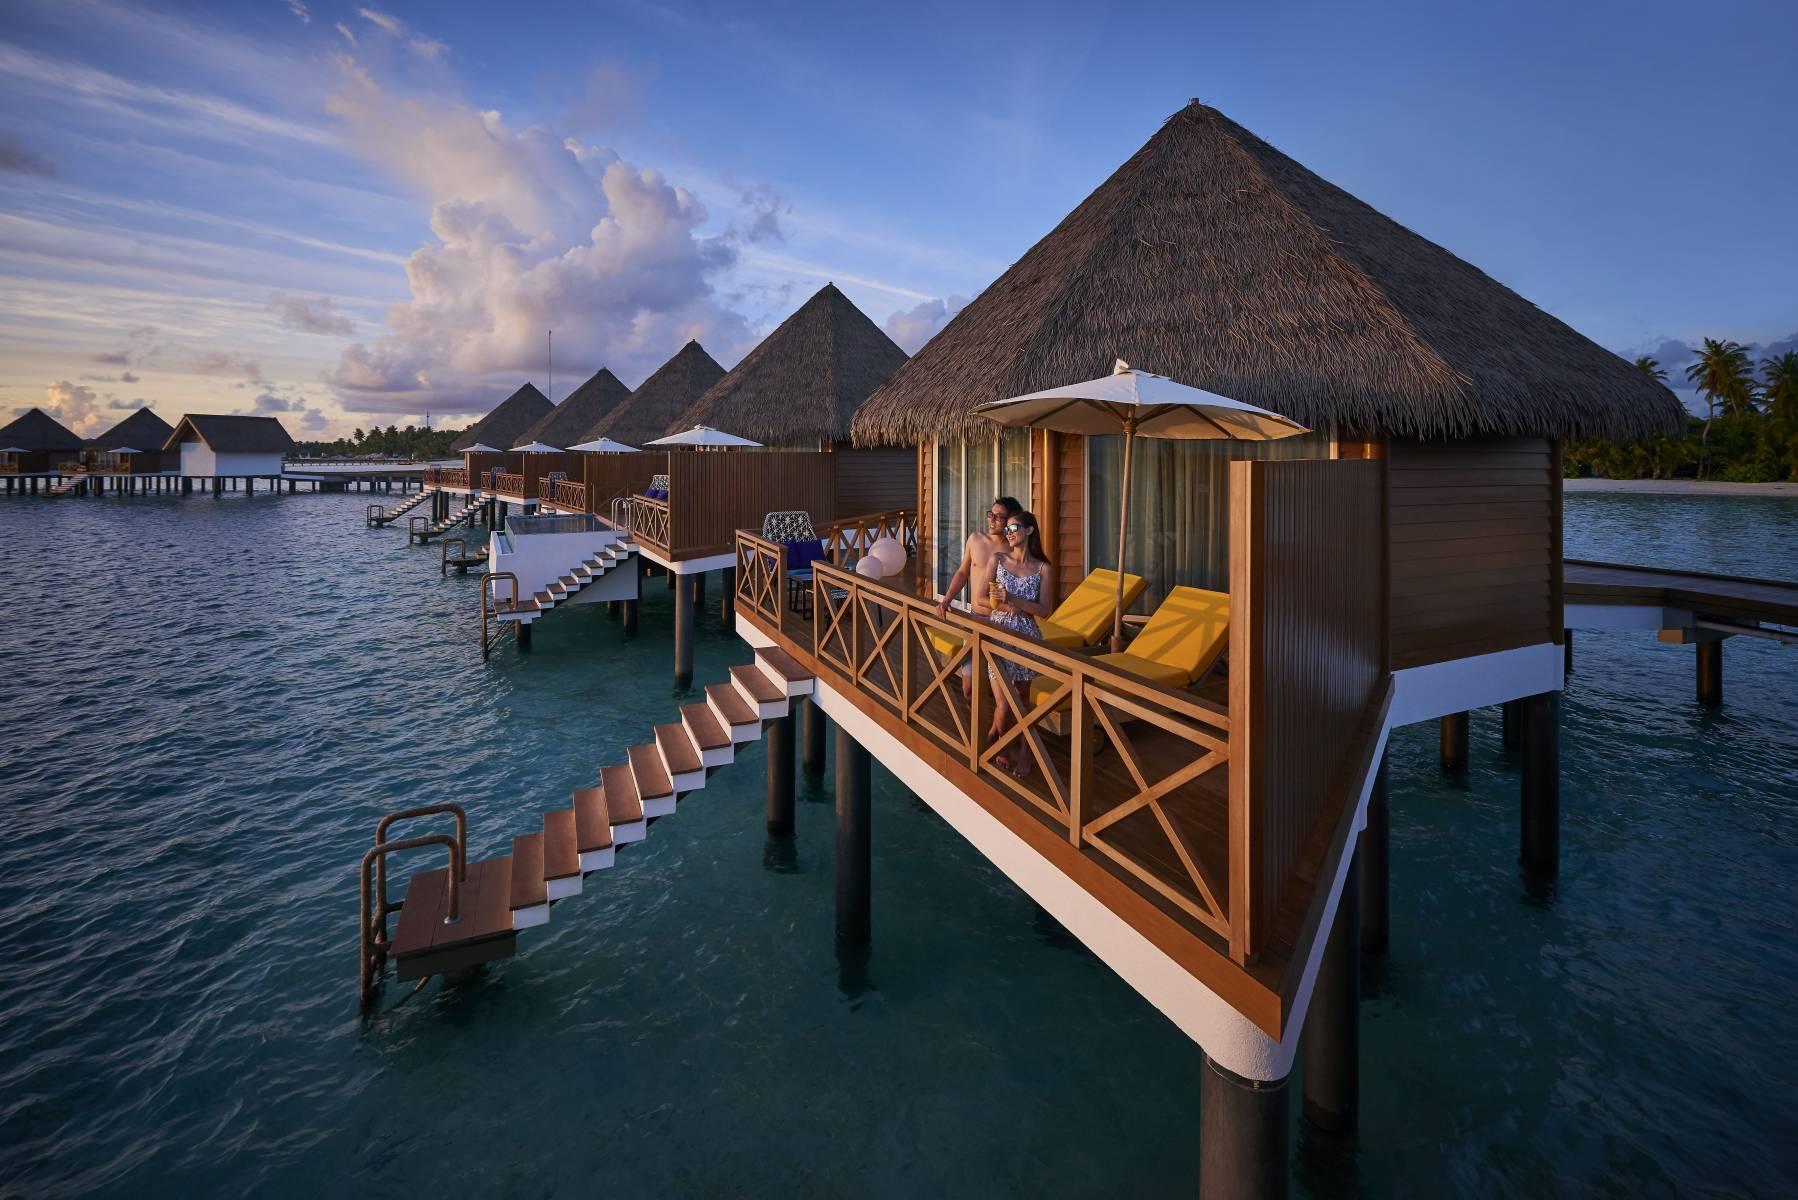 mercure-maldives-kooddoo-resort-genel-007